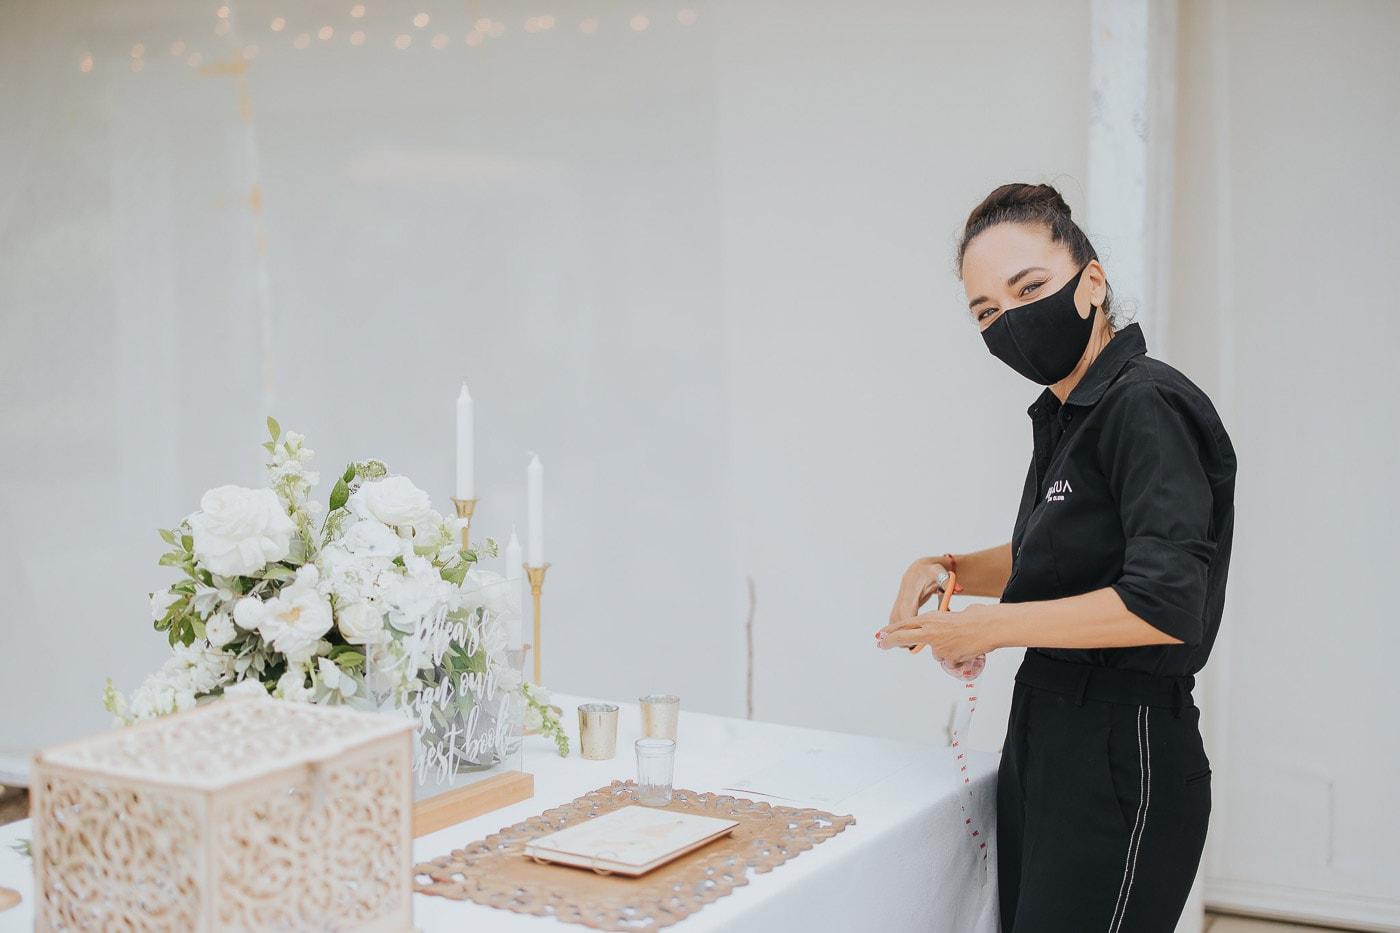 mayte marie wedding planner